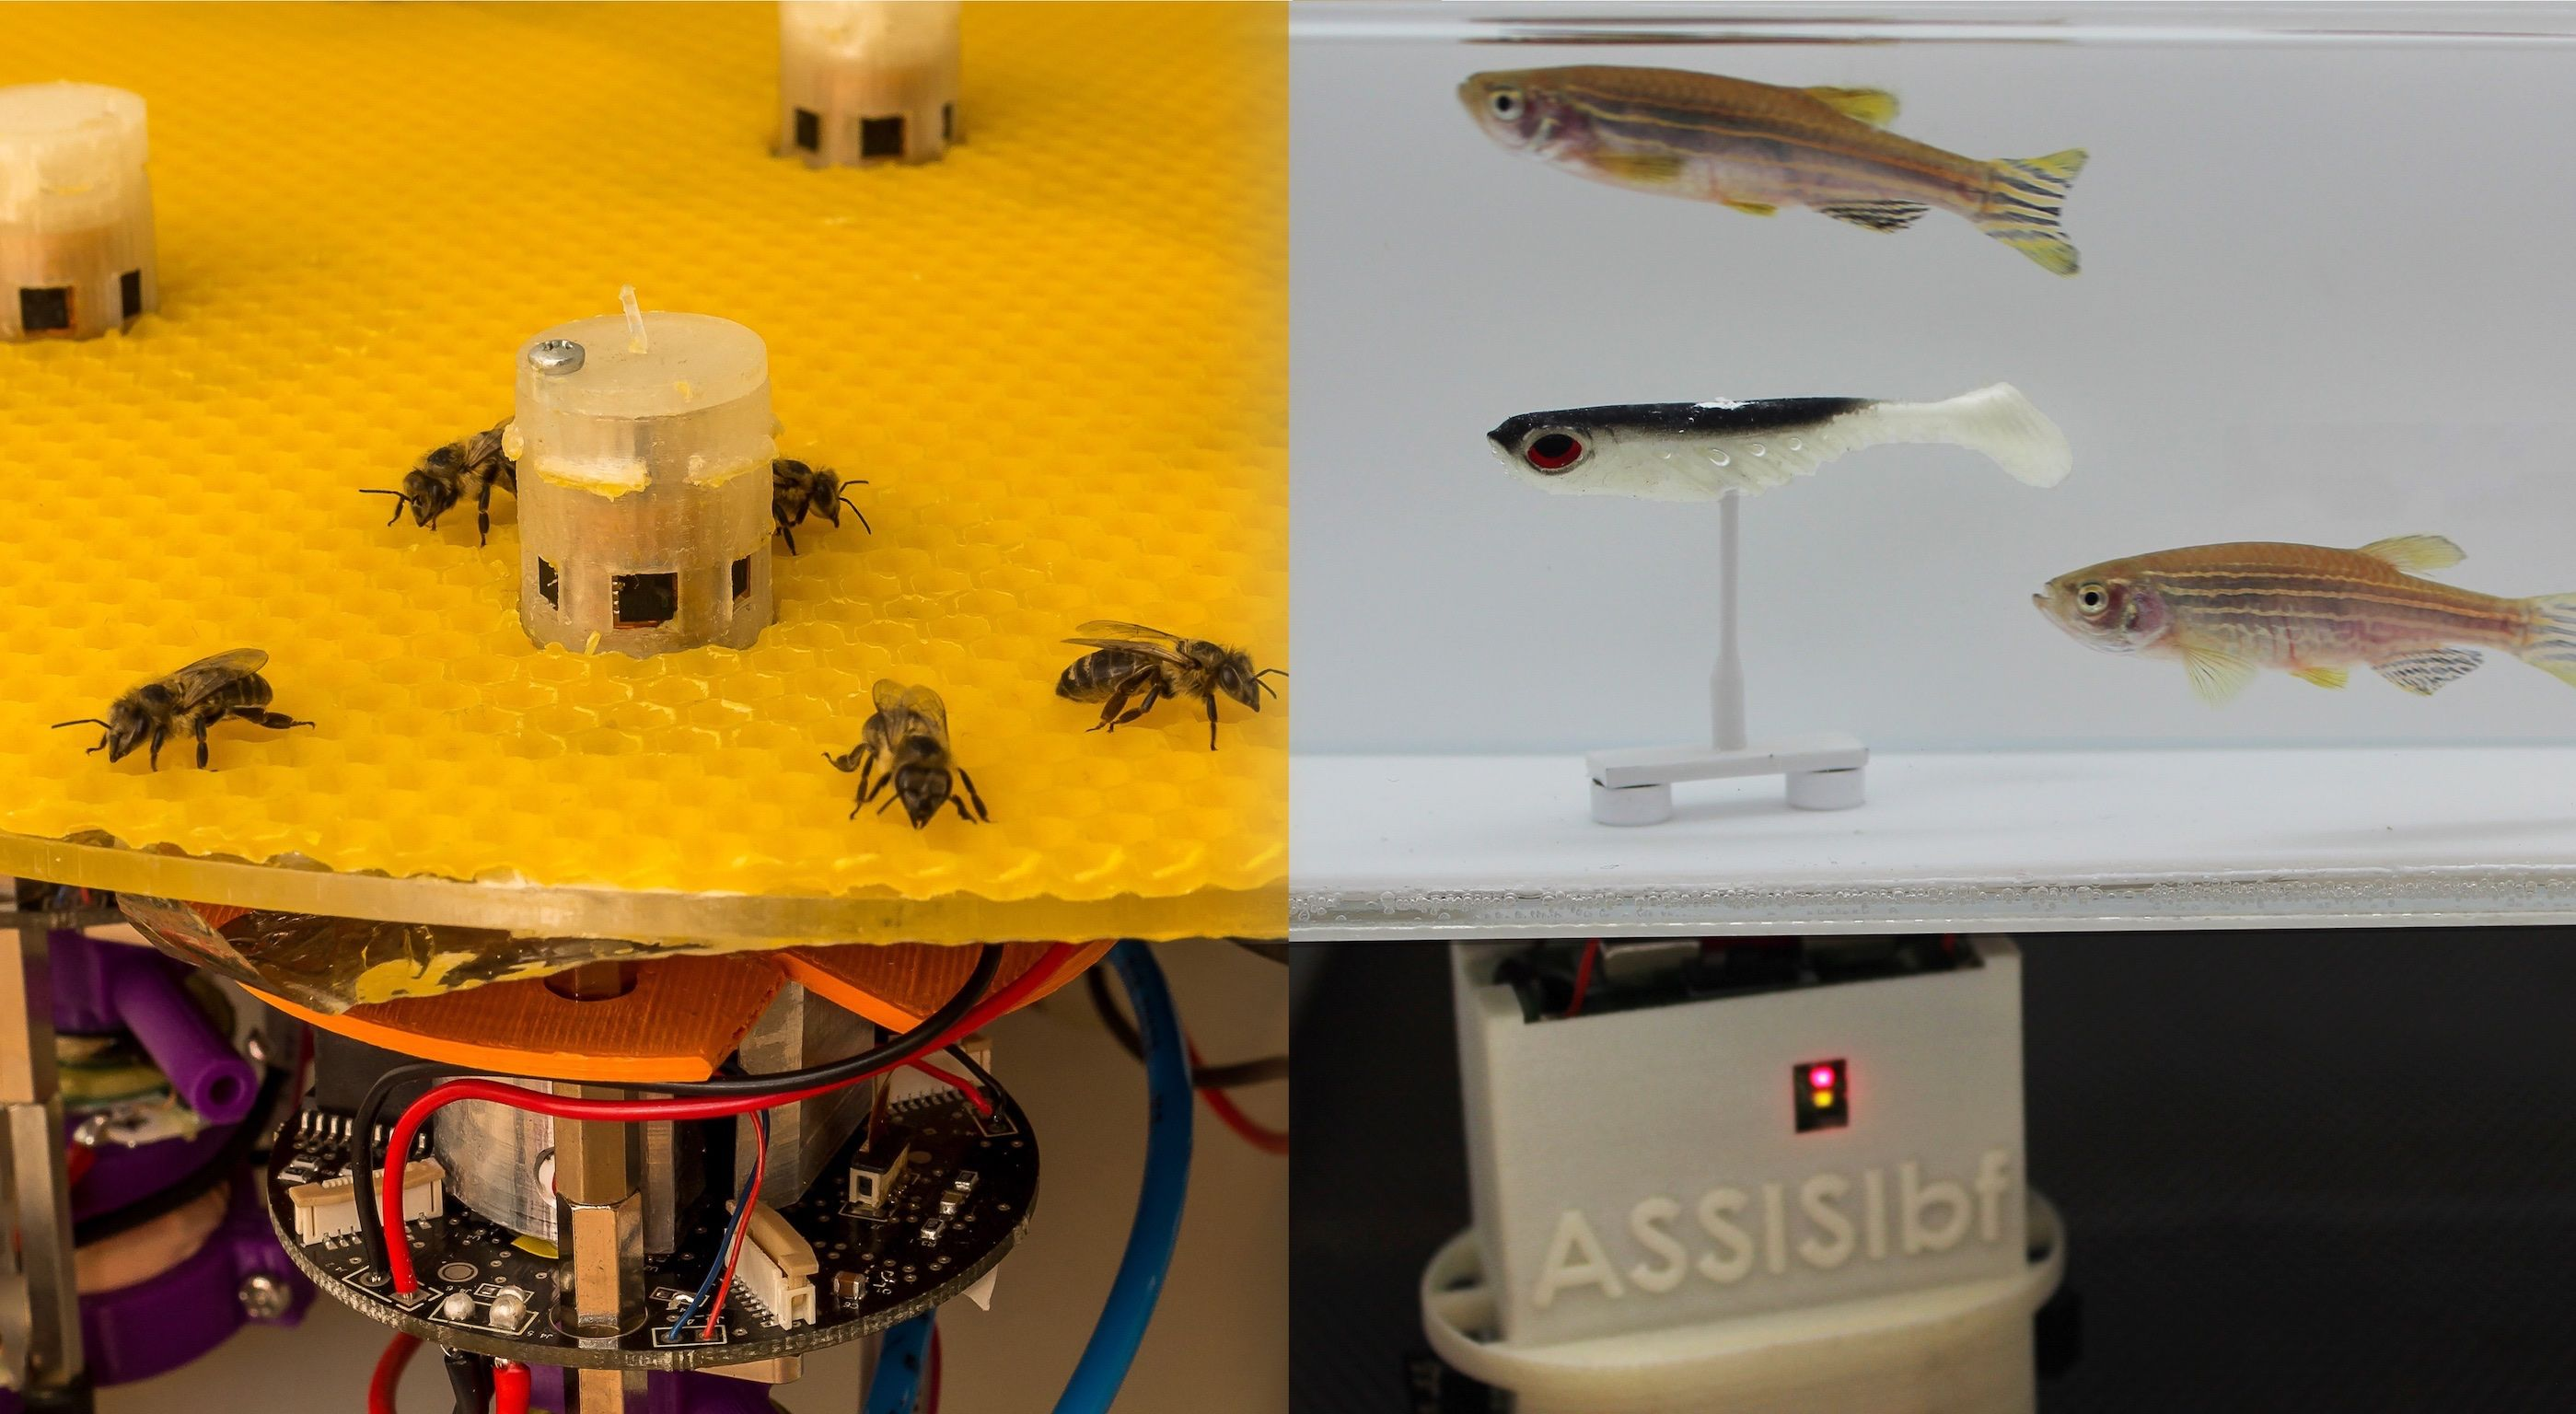 Robots Help Bees Talk to Fish